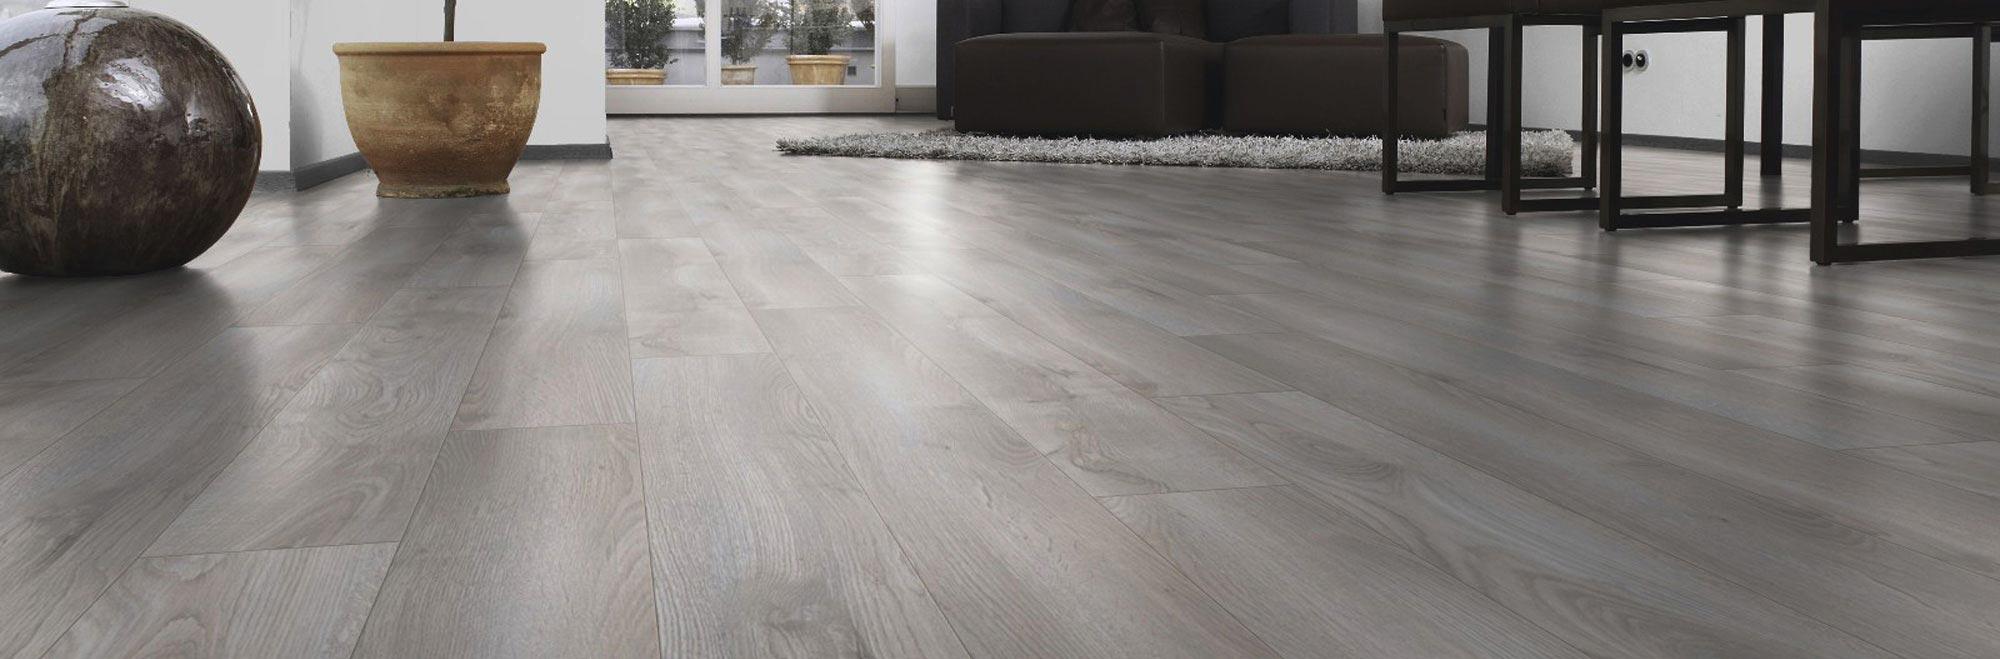 Pro Flooring Store Hardwood Flooring Bamboo Laminate Vinyl Floors